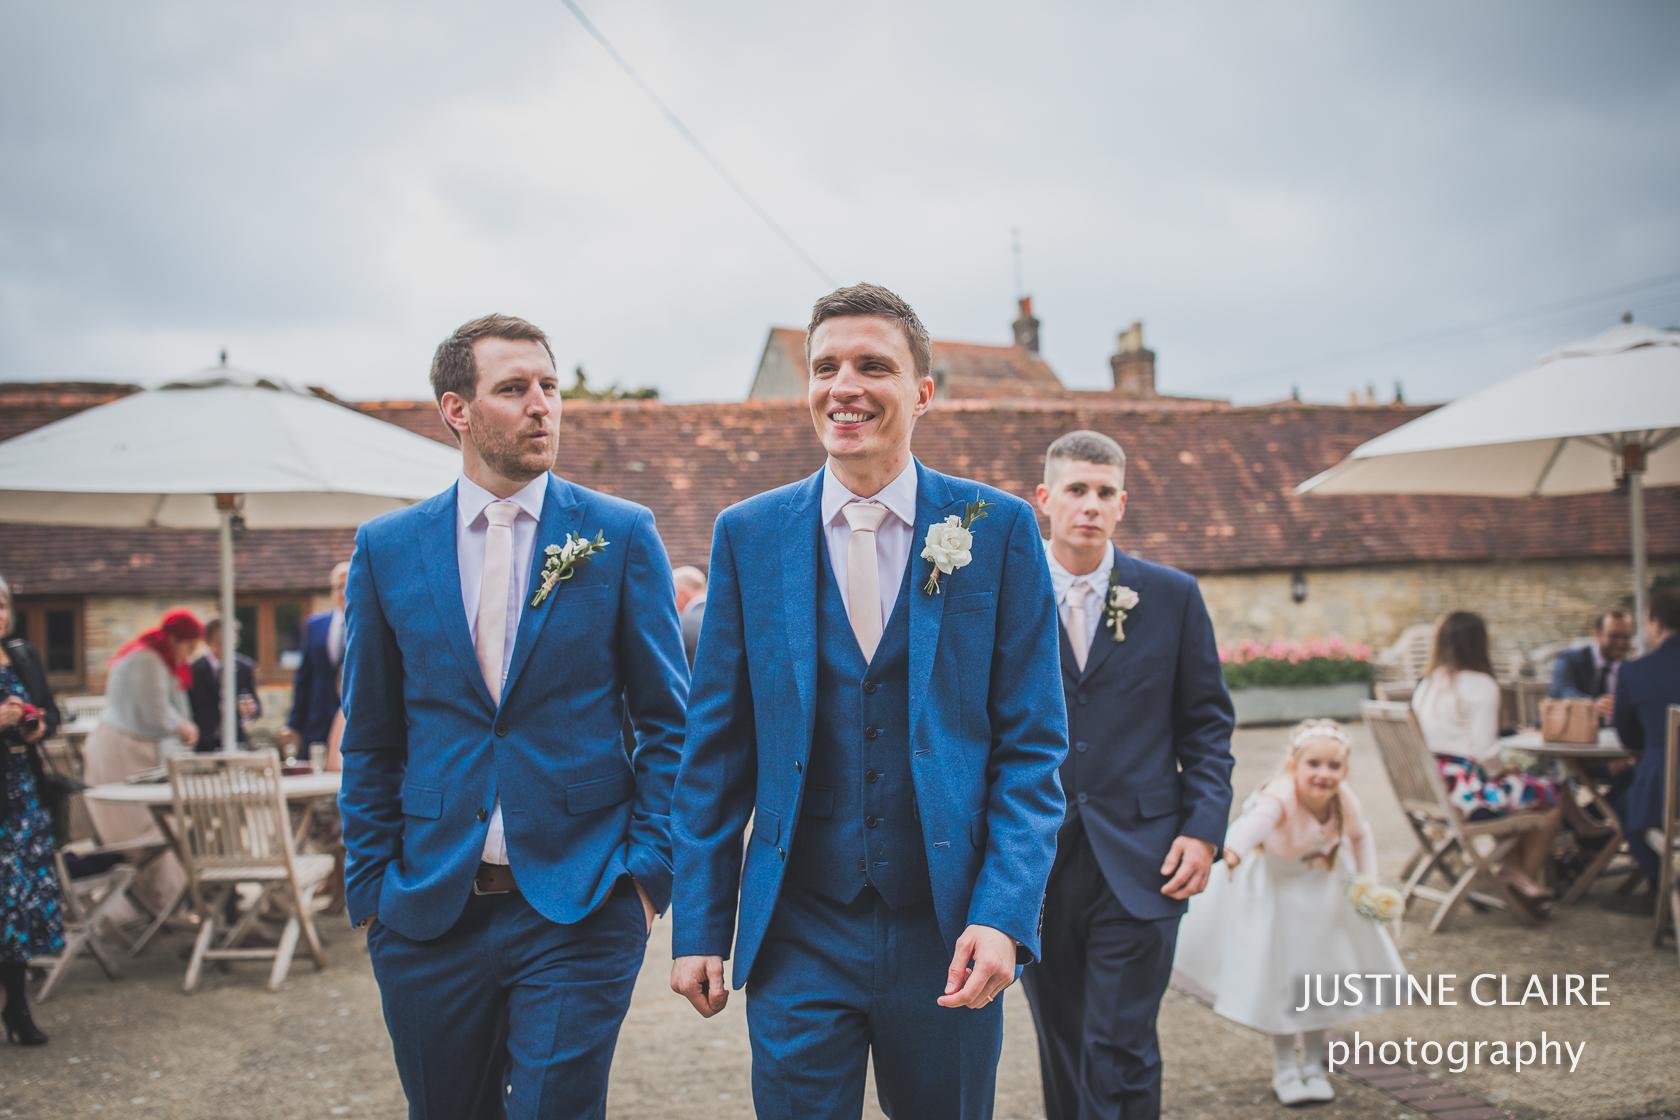 Fitzleroi Fittleworth petworth Billingshurst farm Wedding Photography by Justine Claire photographer Arundel Worthing Brighton-32.jpg